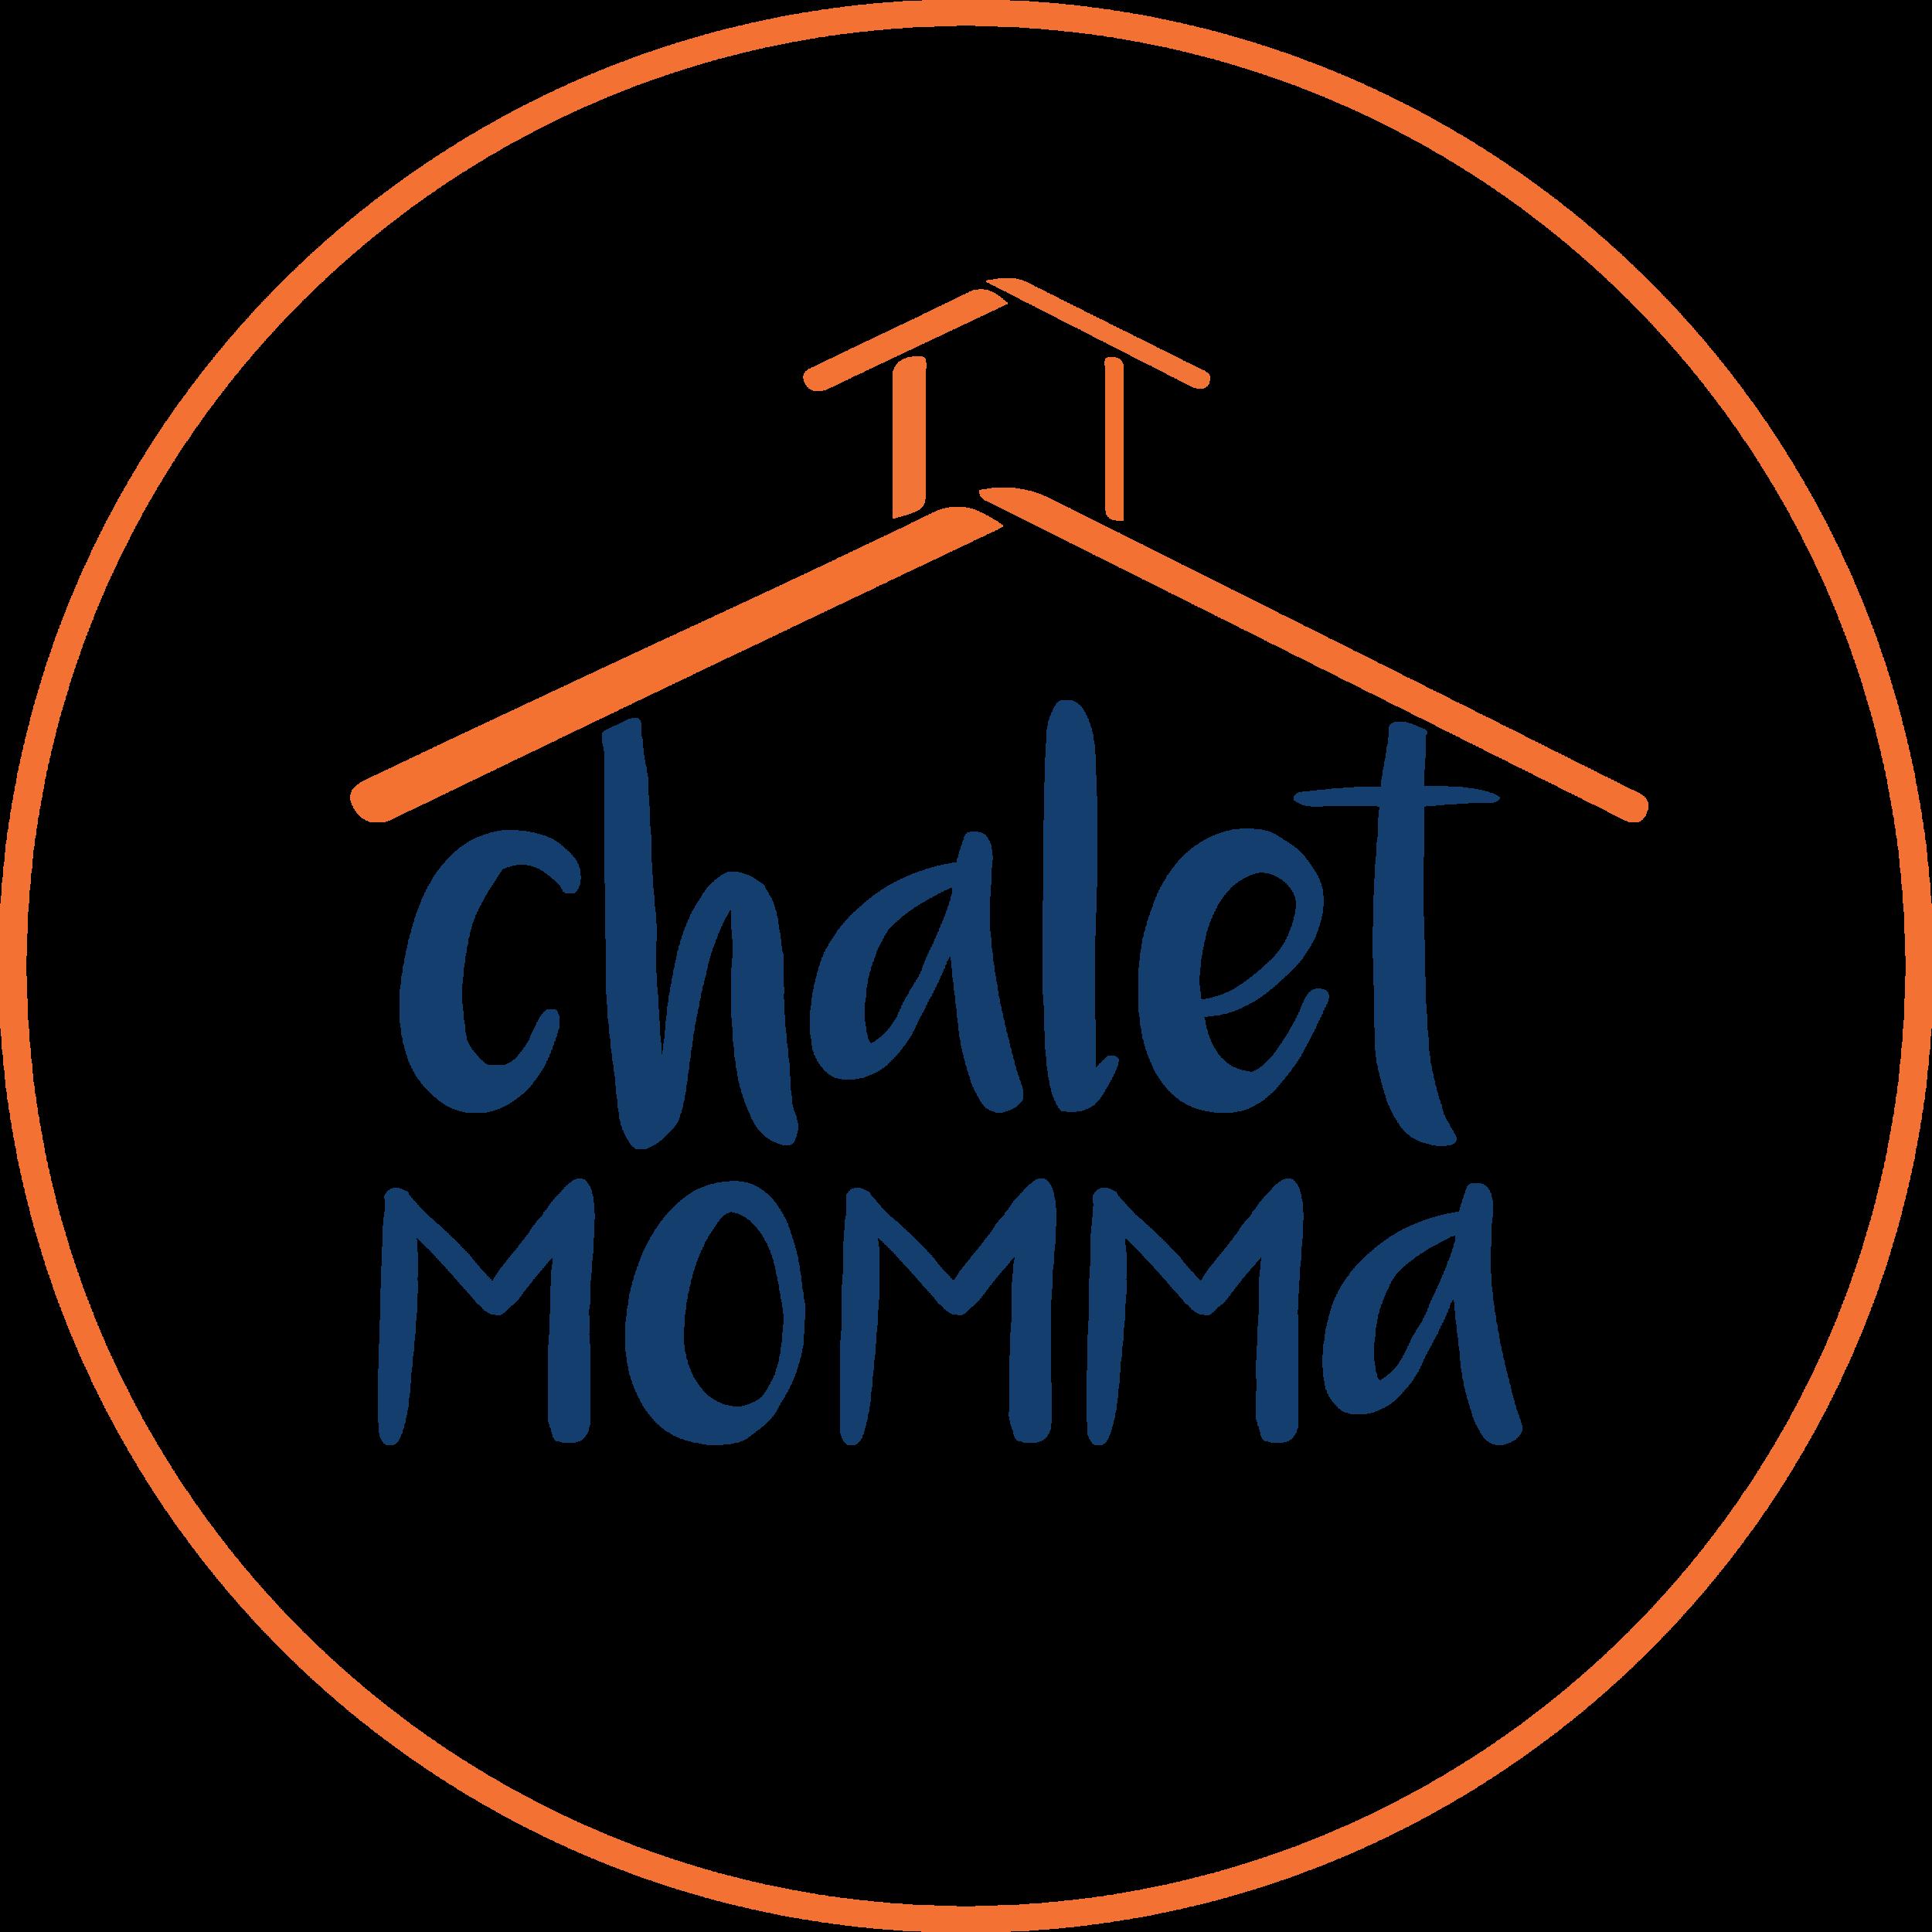 ChaletMomma_CircleLogoNoTM.png